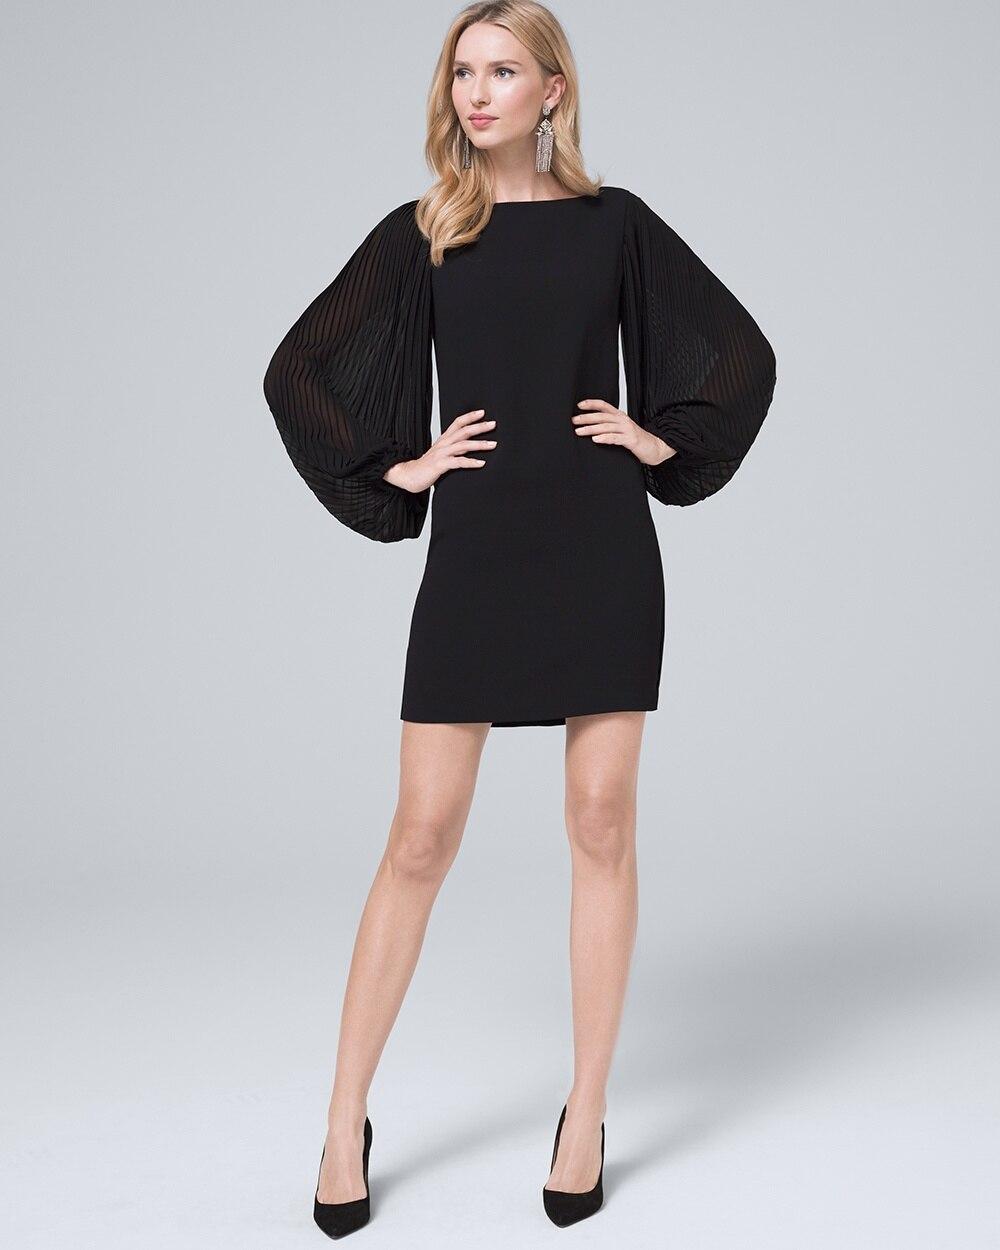 Chiffon Sleeve Black Shift Dress - White House Black Market